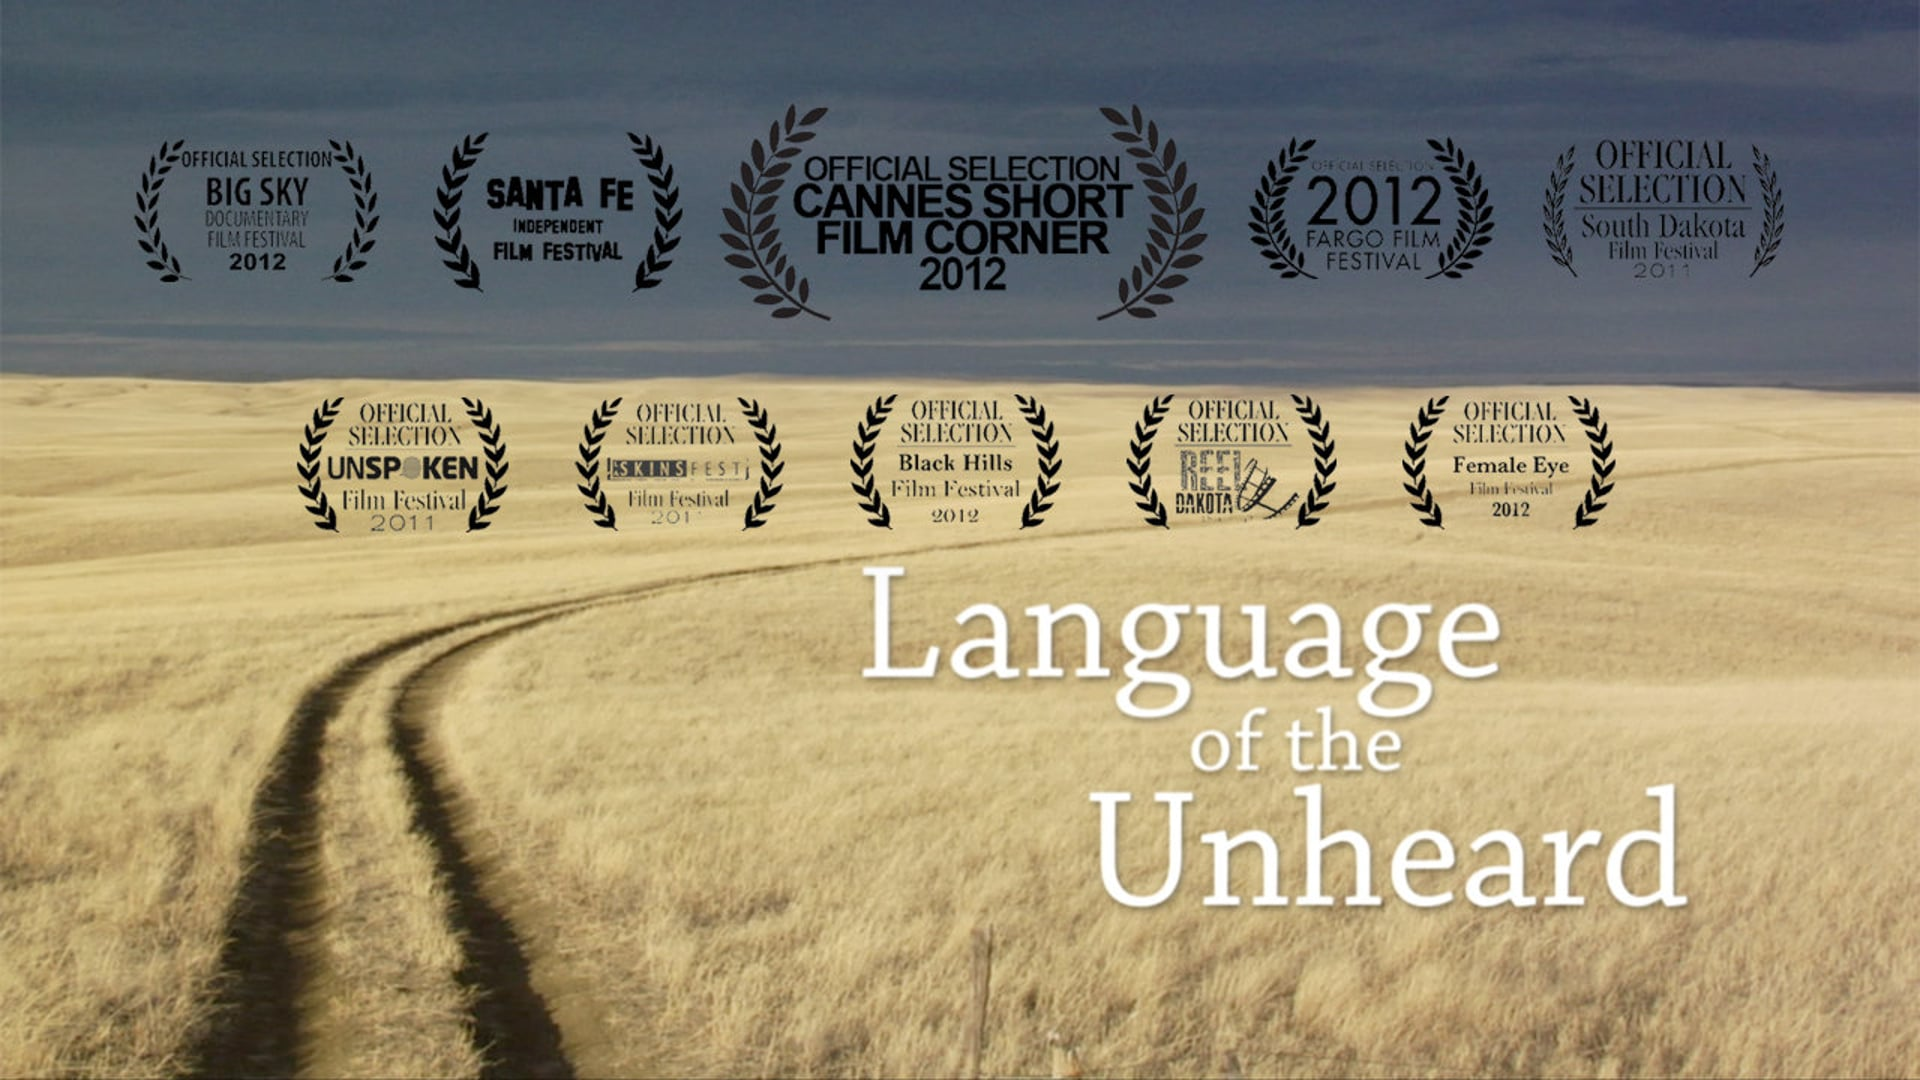 Language of the Unheard